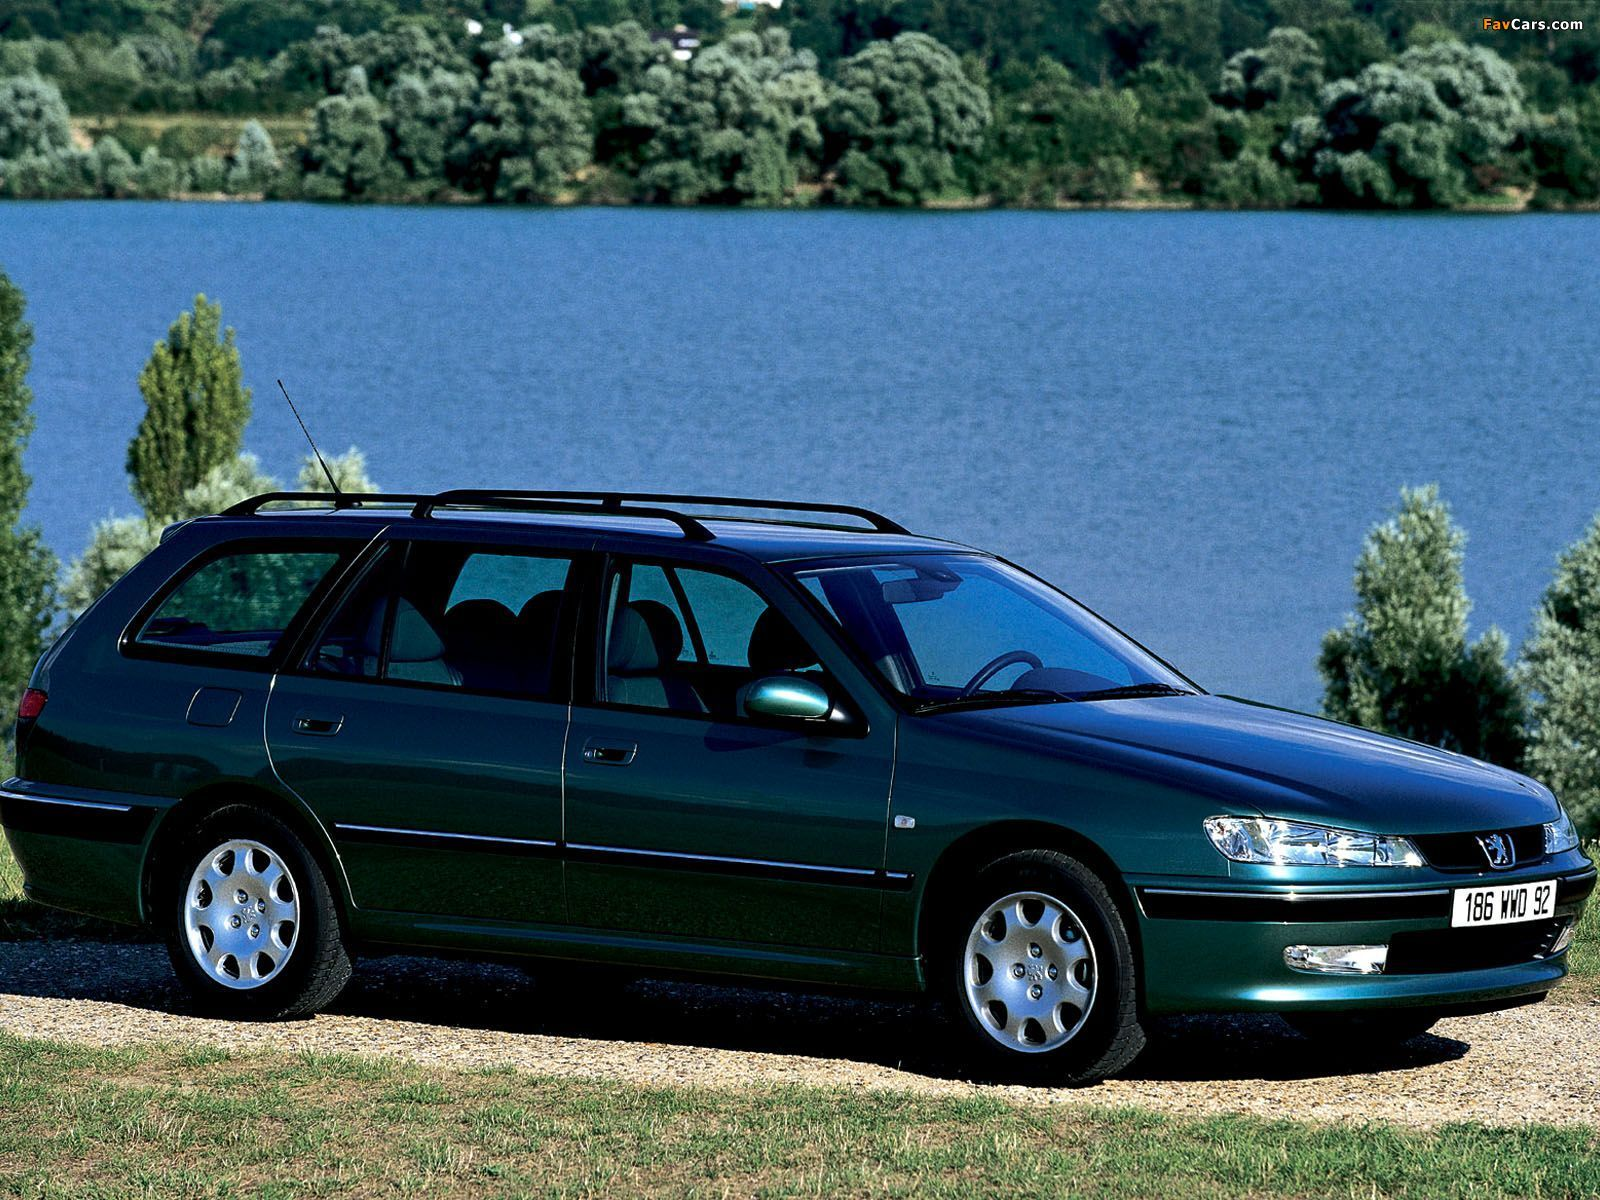 1999 Peugeot 406 Estate Car   Peugeot   Pinterest   Best Peugeot and